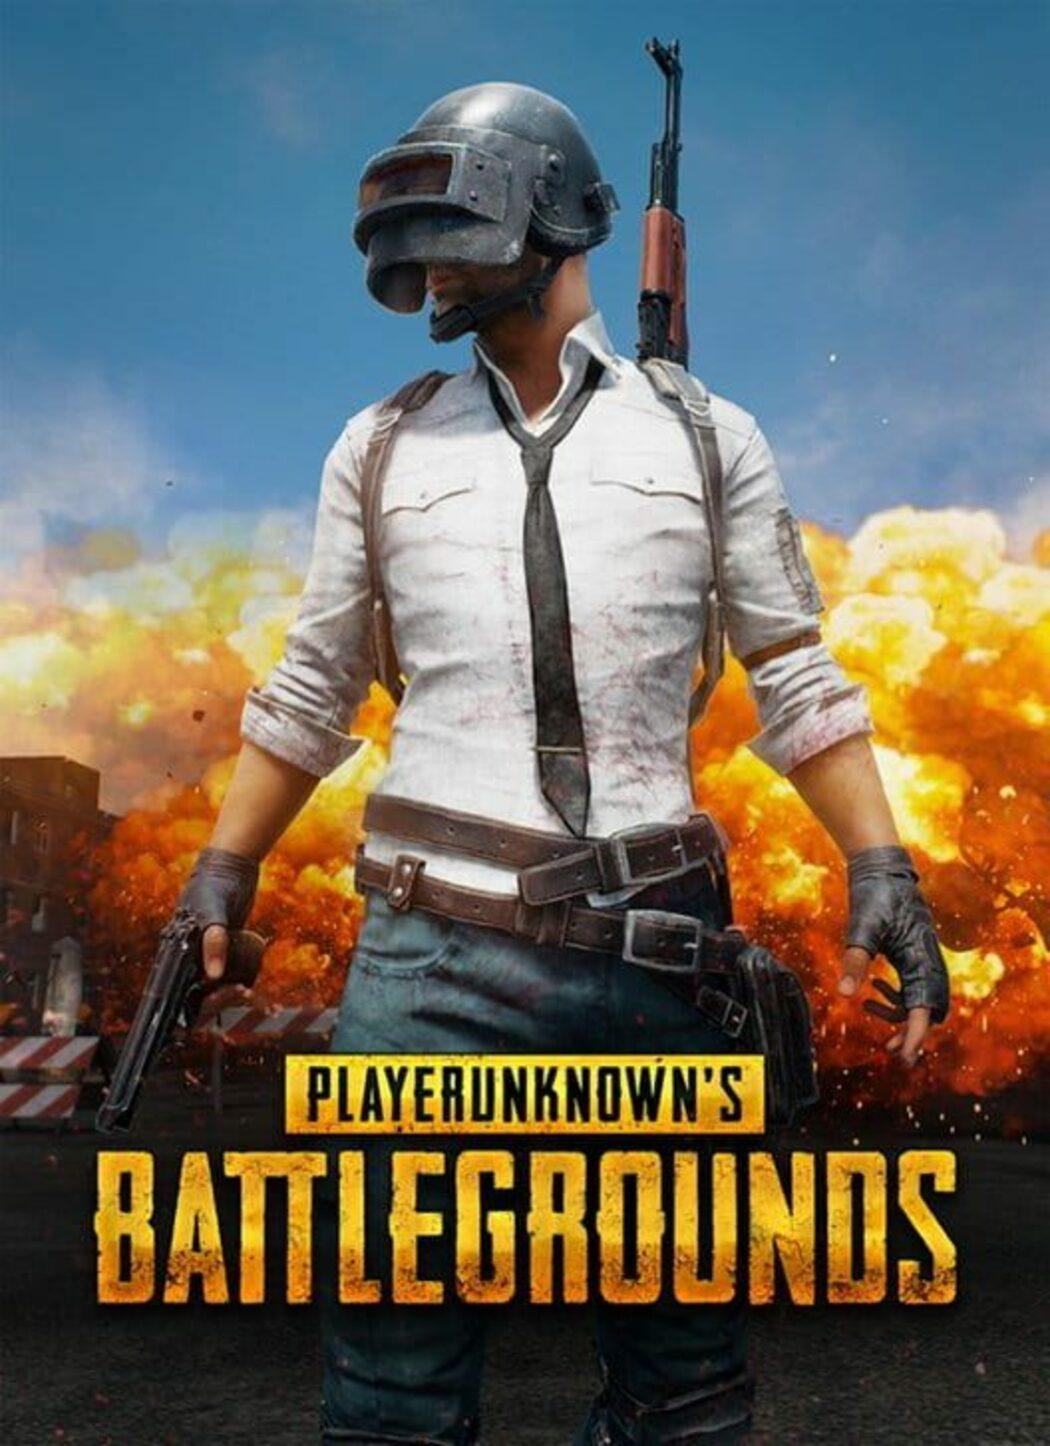 playerunknowns battlegrounds gameplay ps4